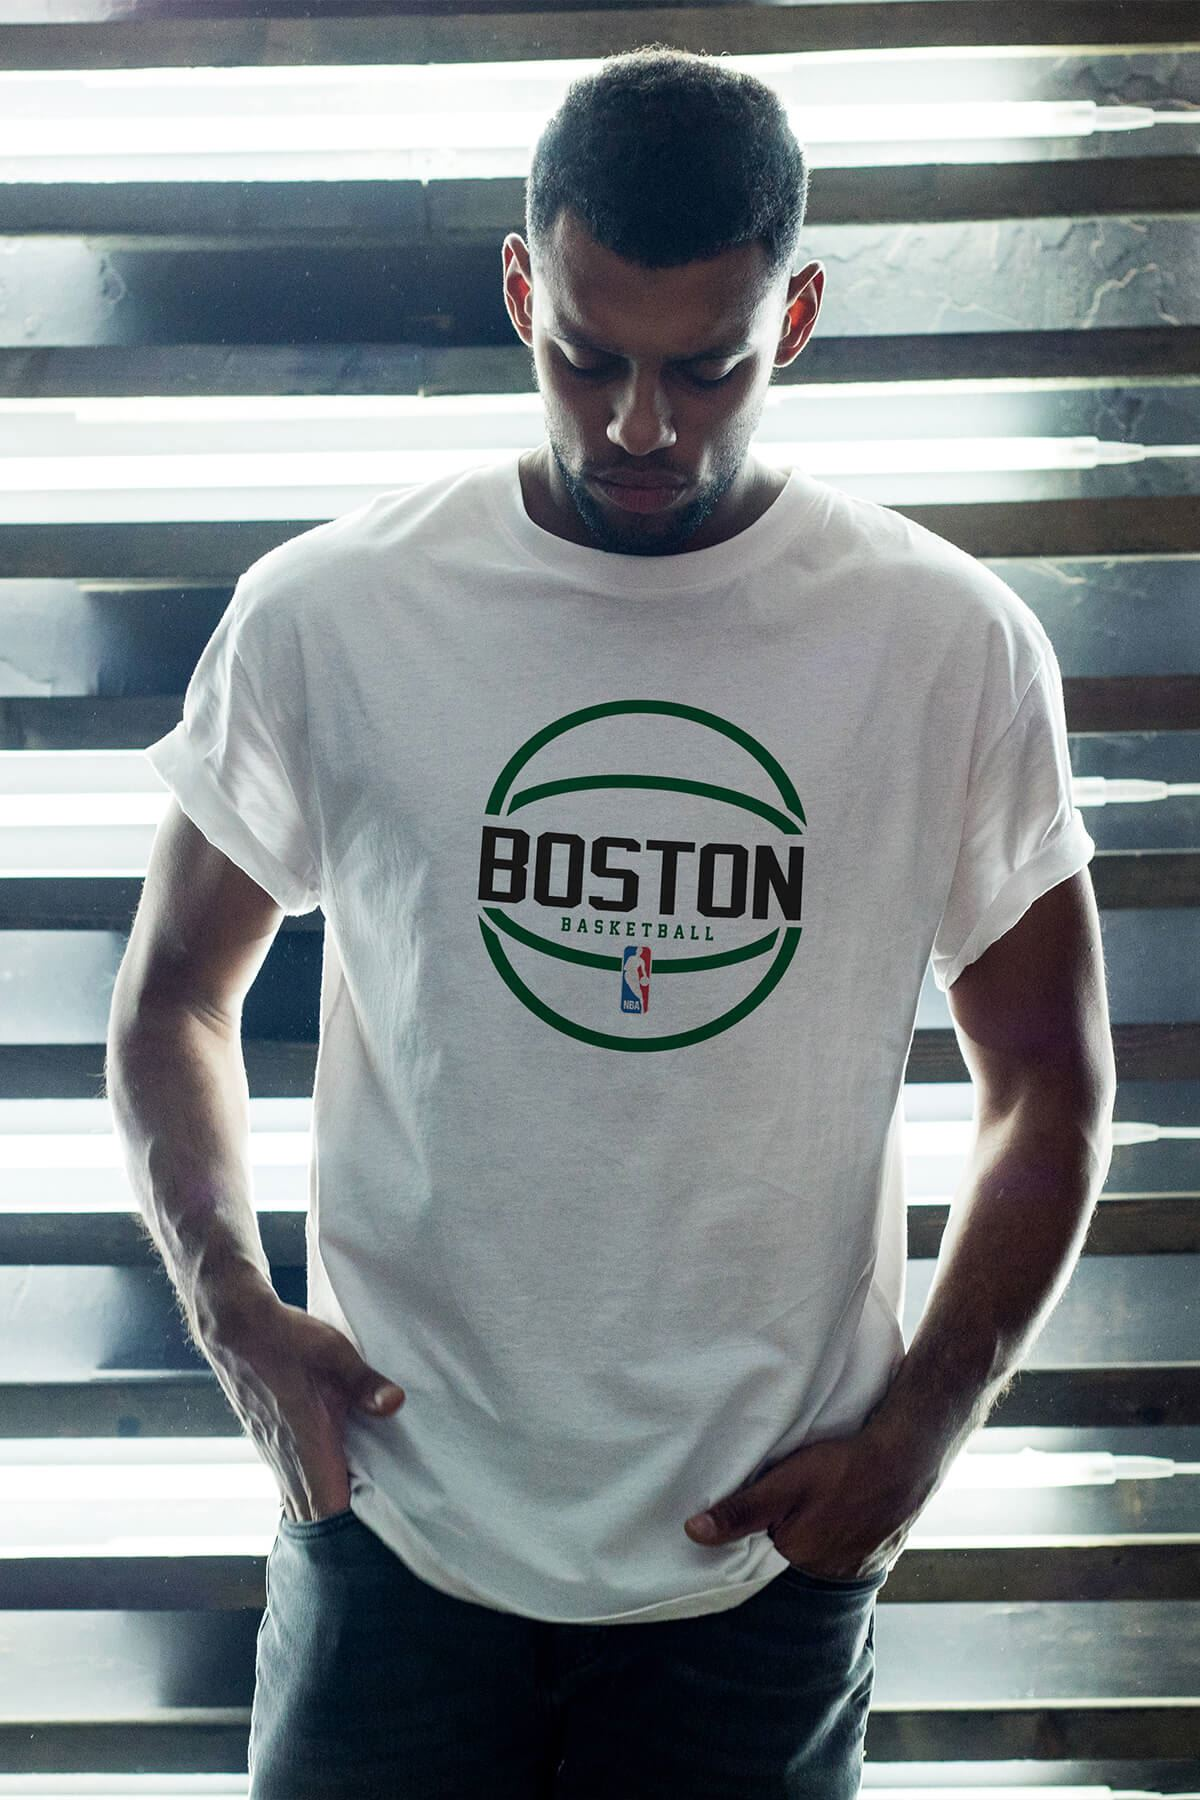 Boston Celtics 30 Beyaz Erkek Oversize Tshirt - Tişört